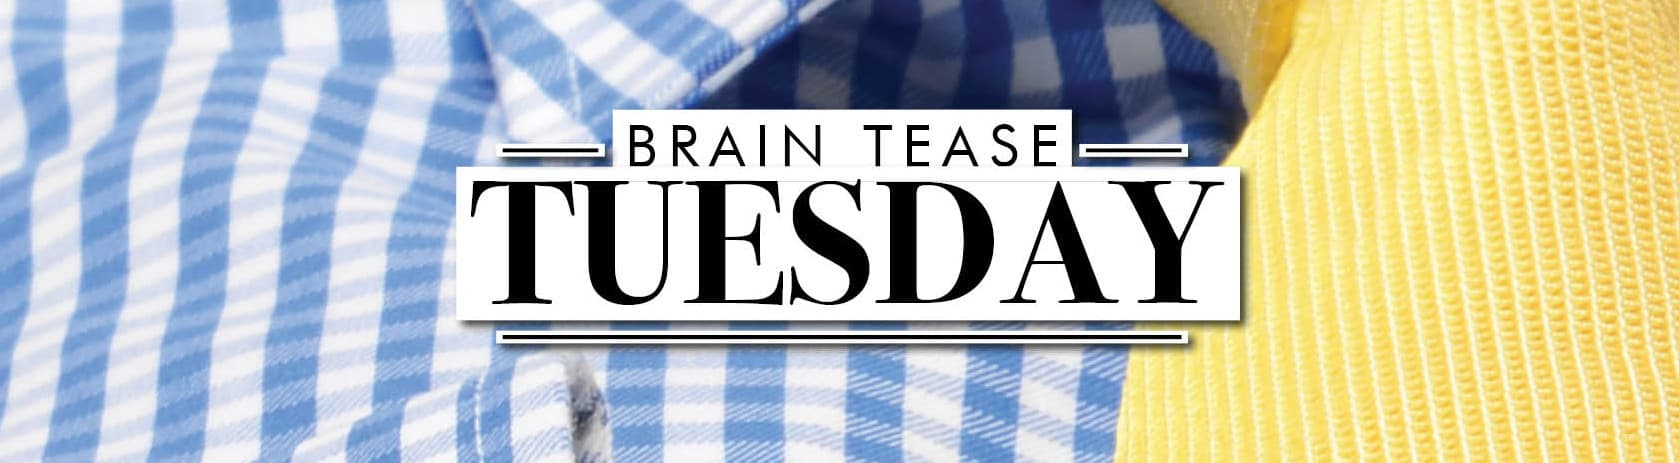 Brain Tease Tuesday Week 17